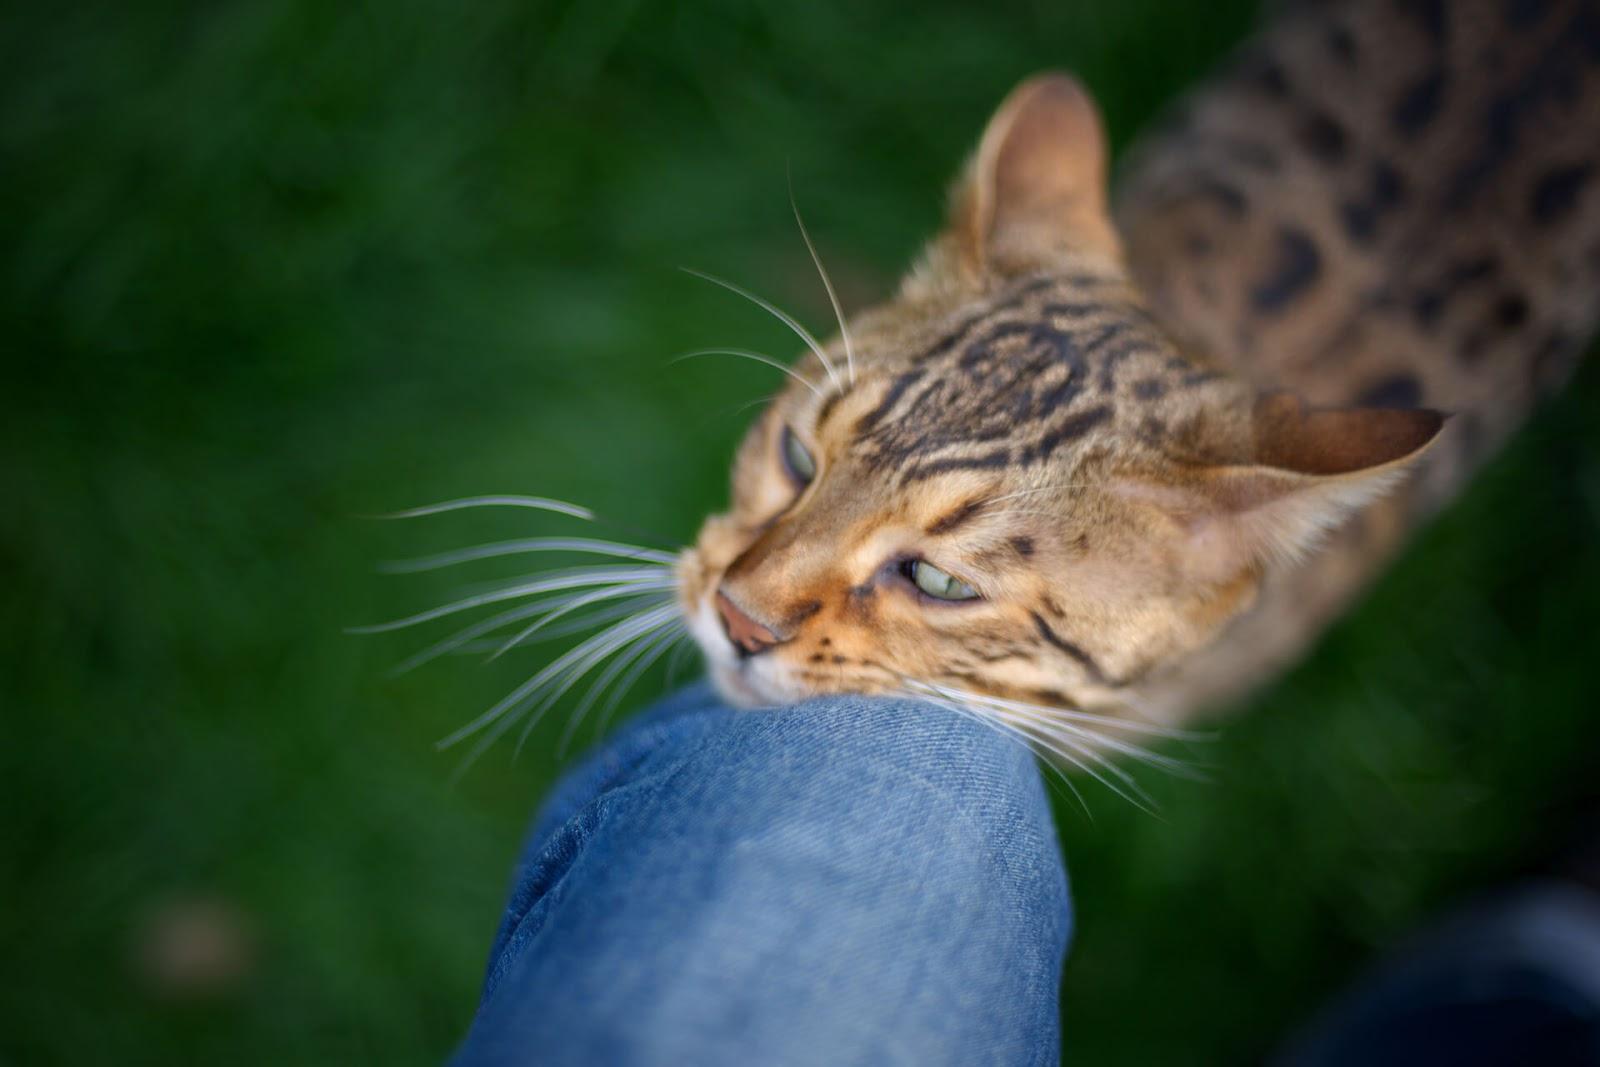 Cat rubbing its cheek against a human's leg